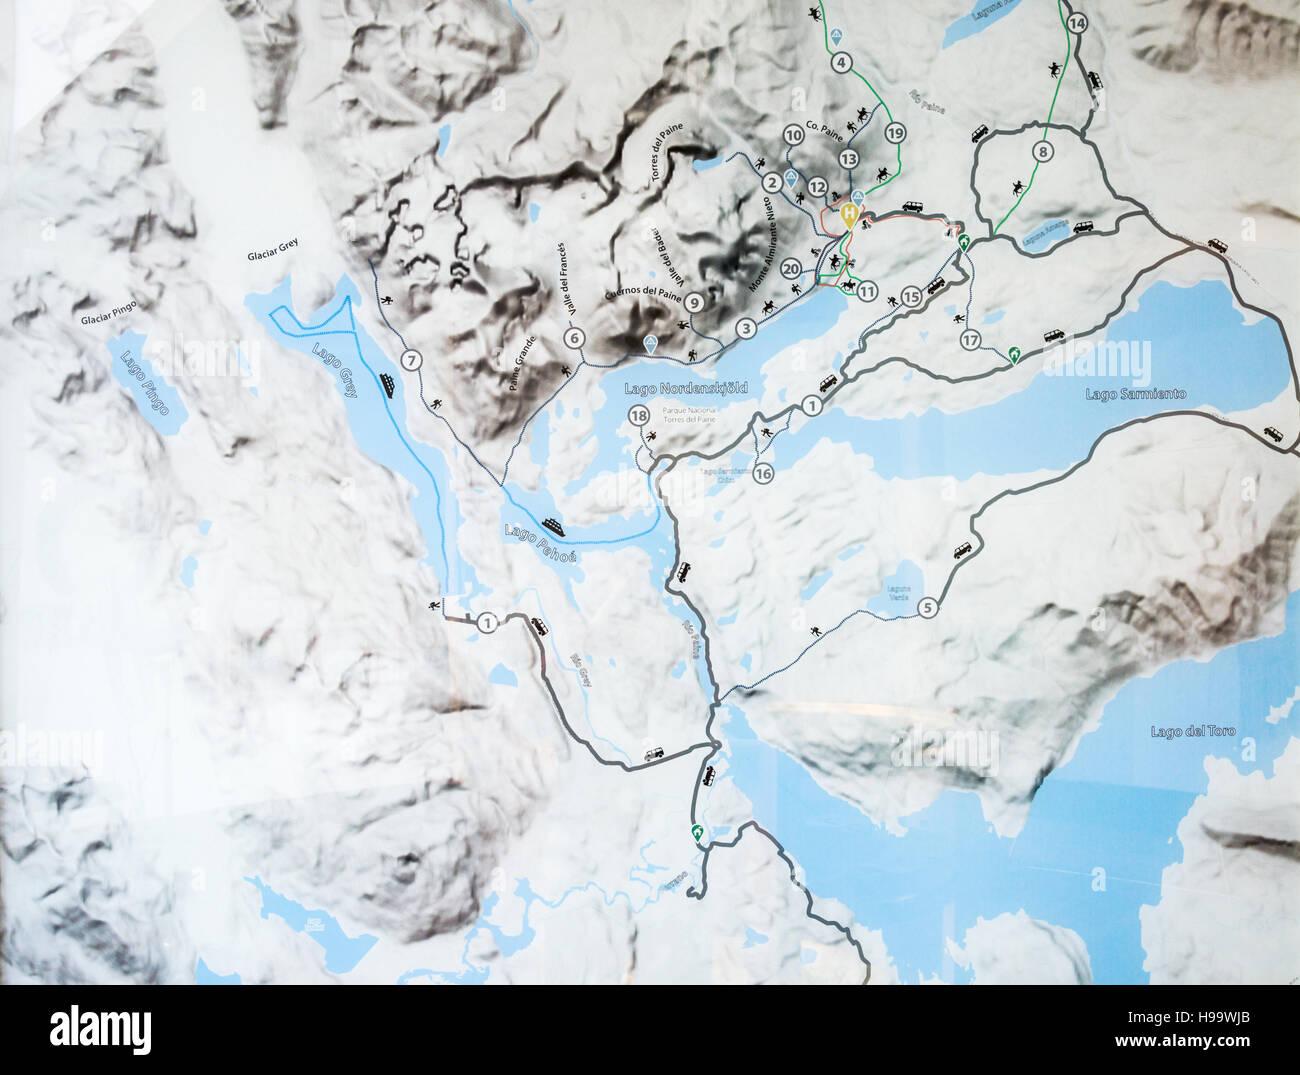 Patagonia Chile Trail Map W Circuit - Stock Image